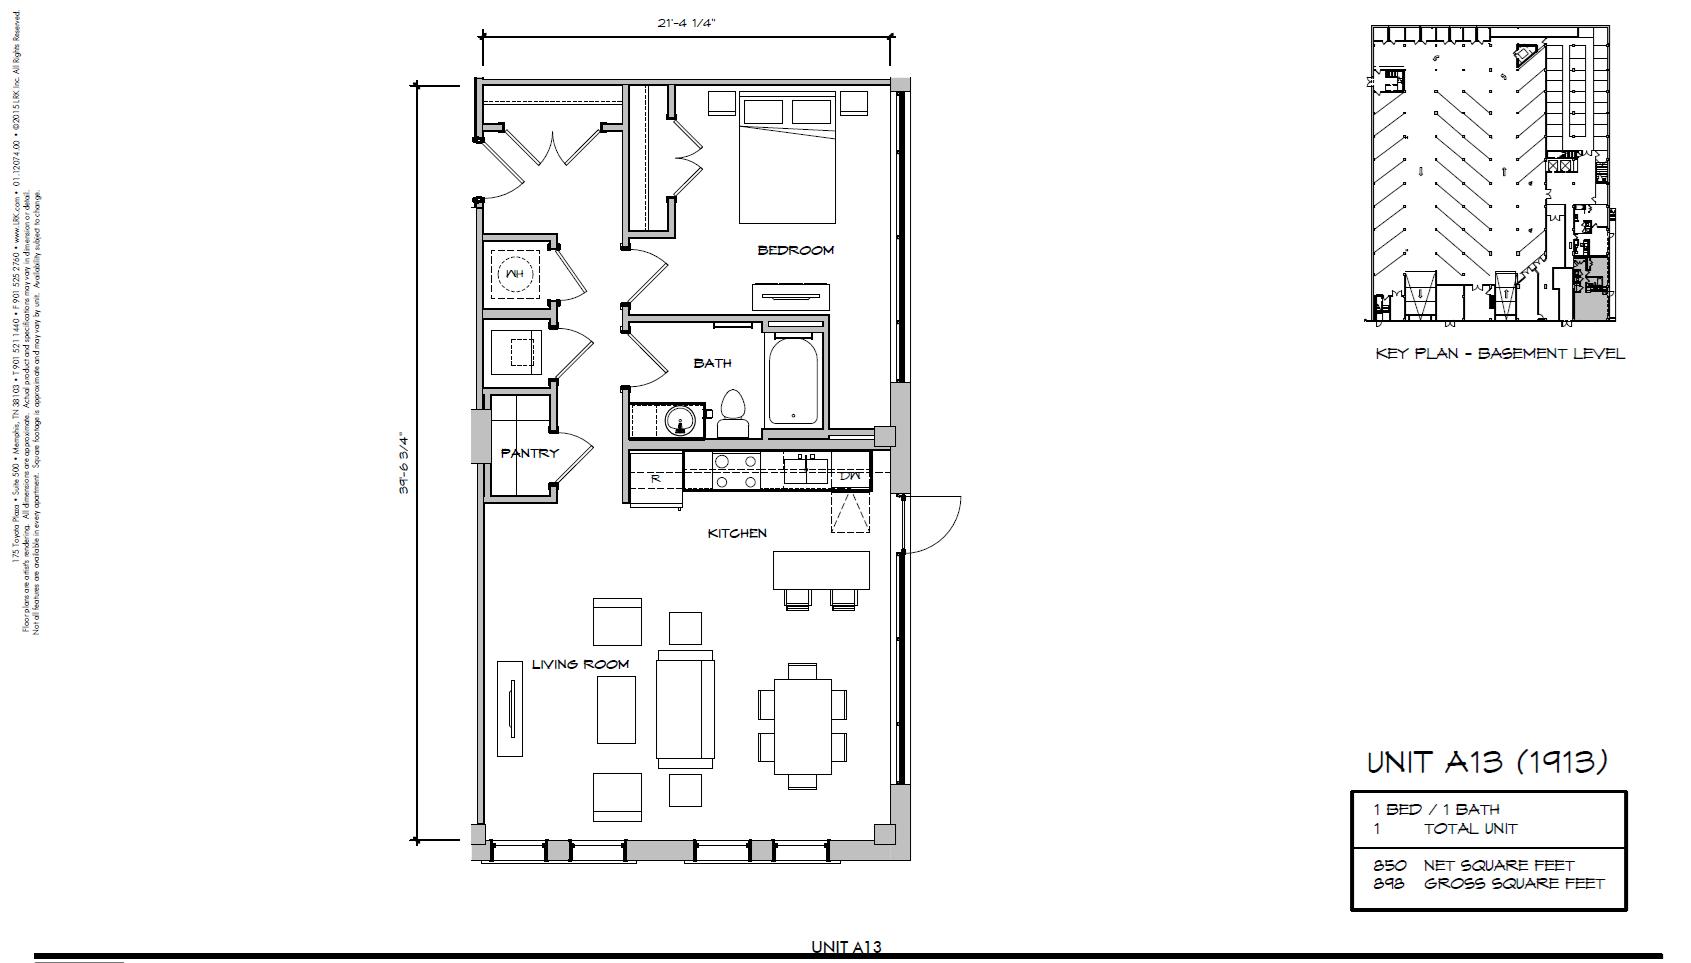 A13 - 1913 Floor Plan 3